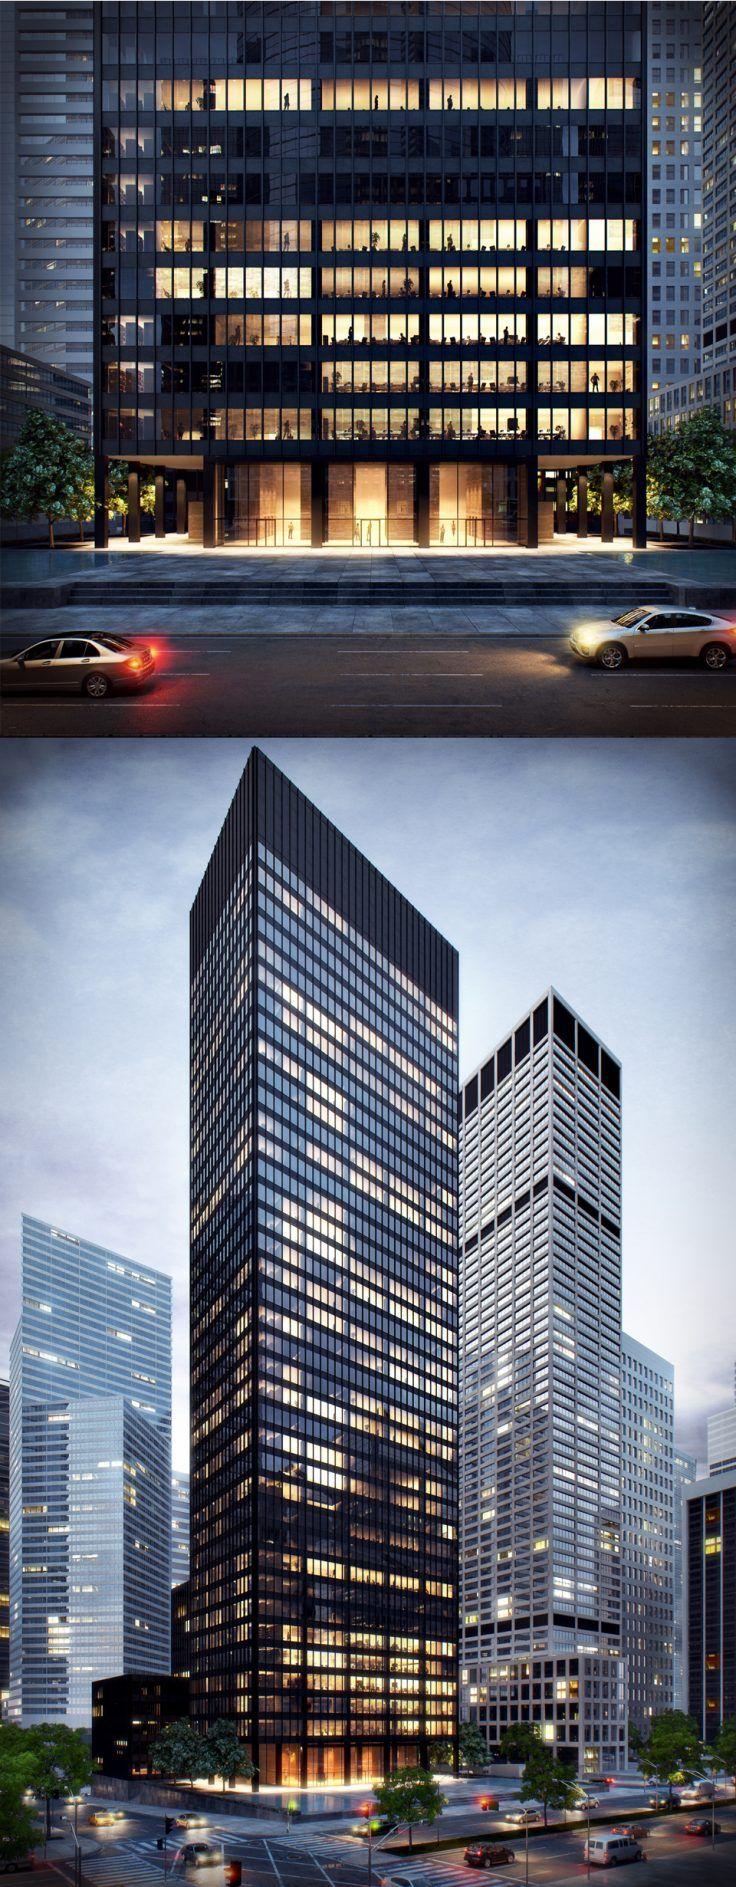 Seagram Building by Guilherme Moura Santos